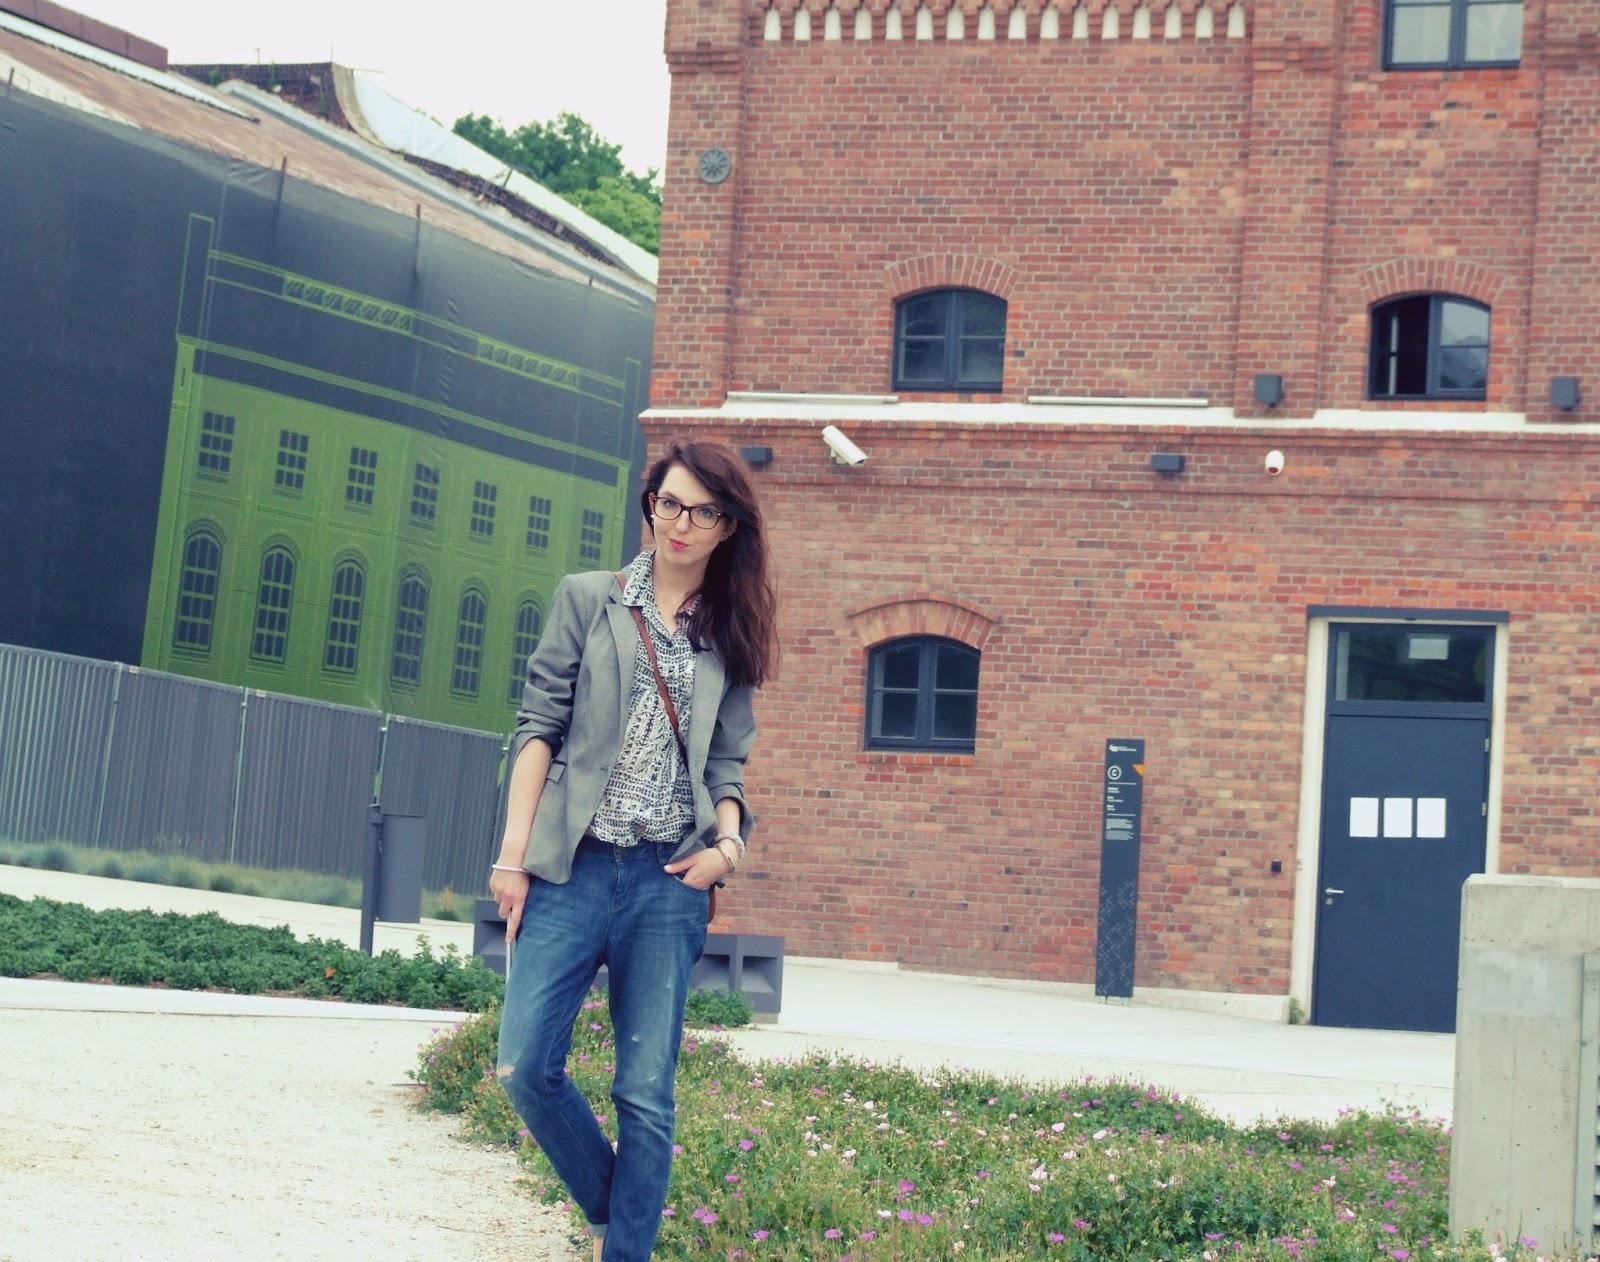 Śląsk, muzeum, historia